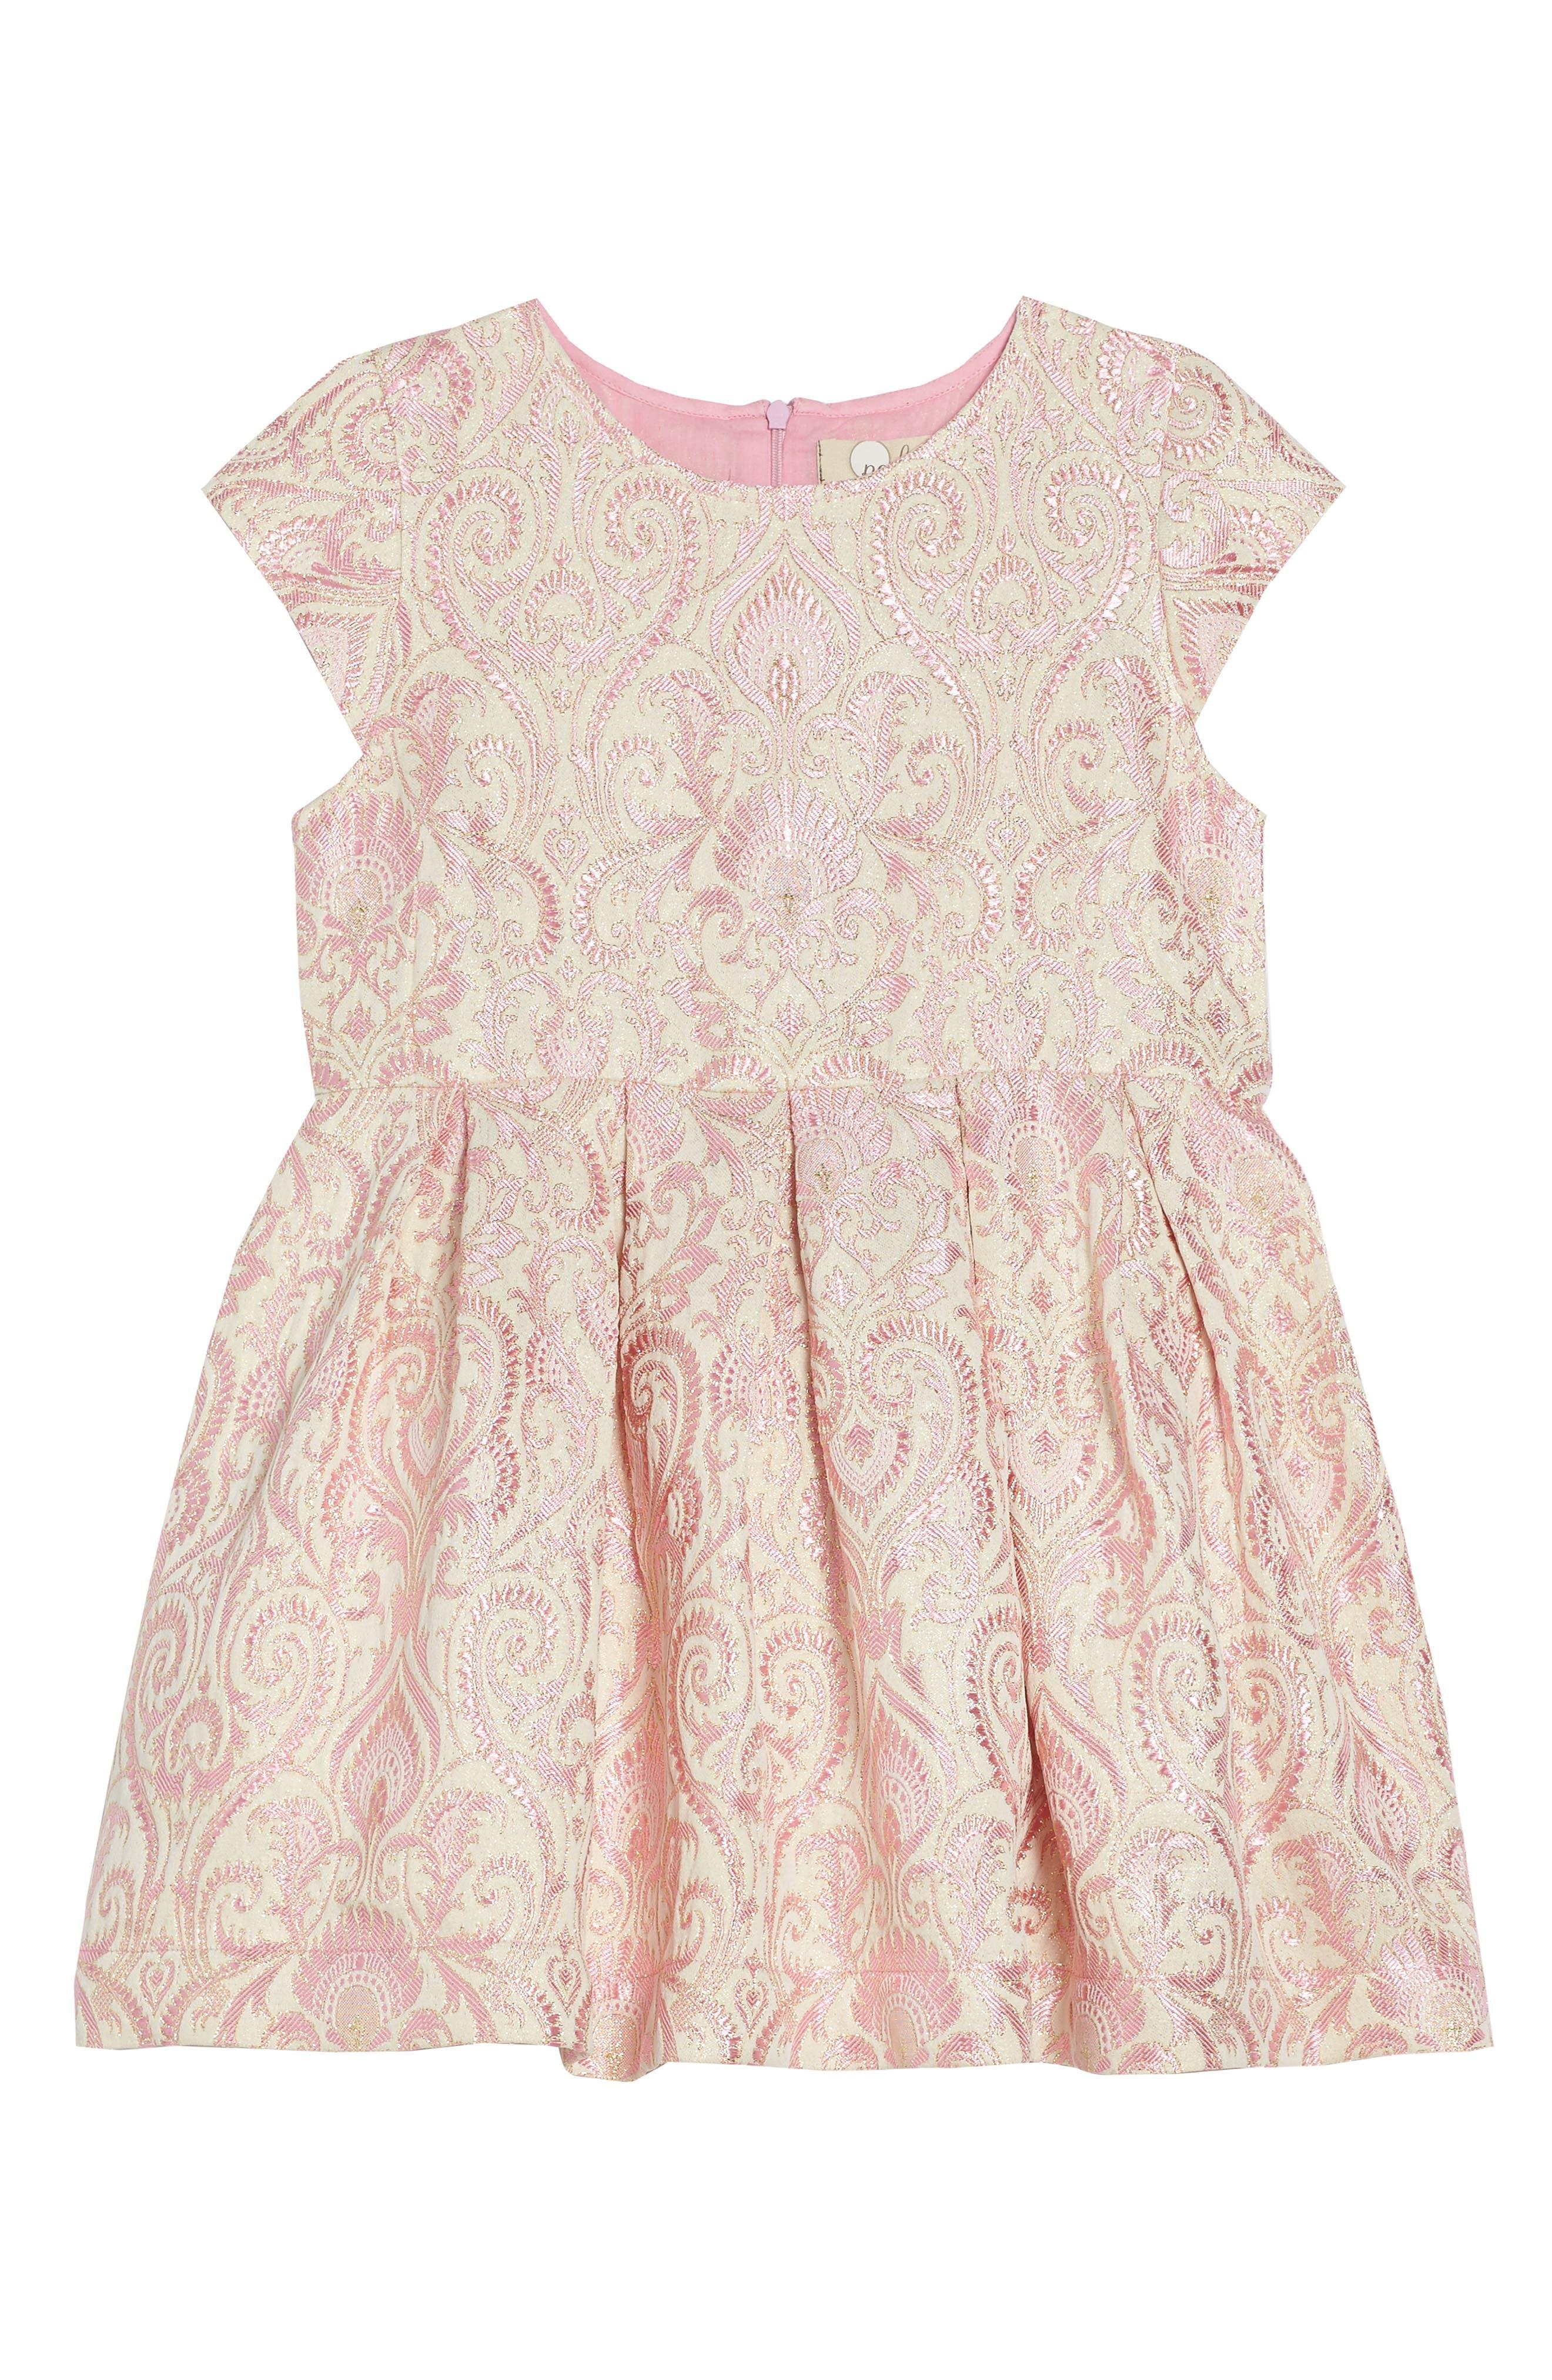 Lenox Brocade Dress,                             Main thumbnail 1, color,                             Pink